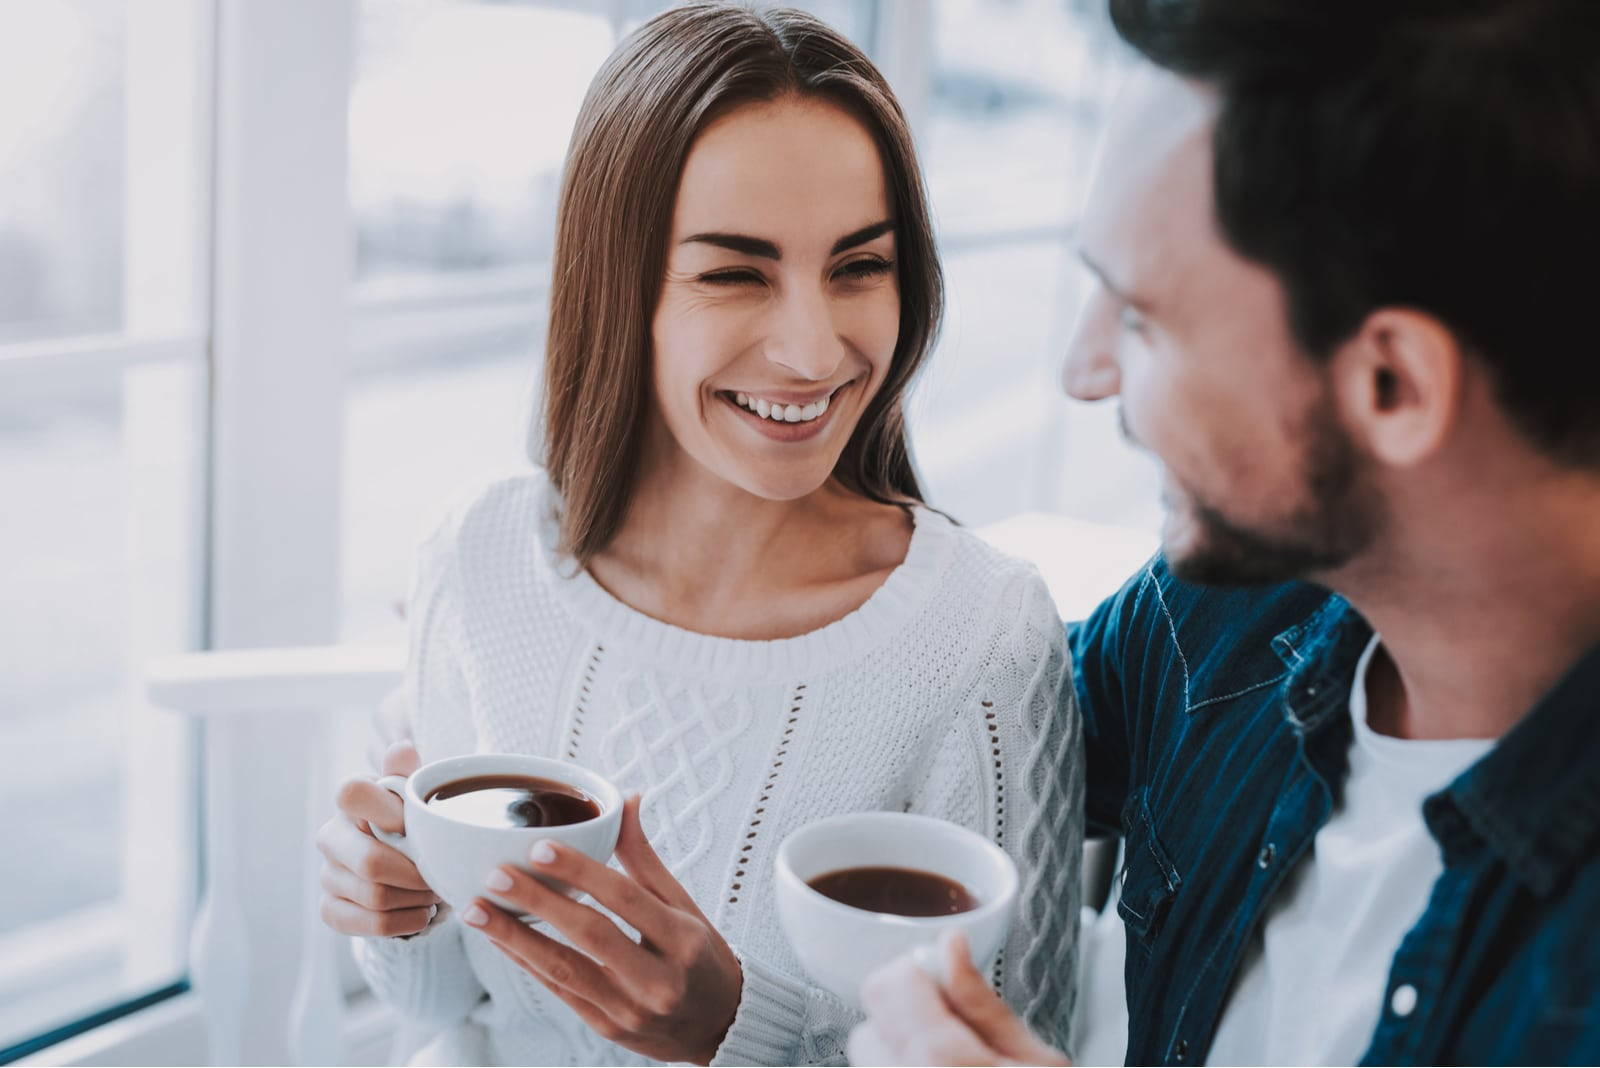 man making woman laugh